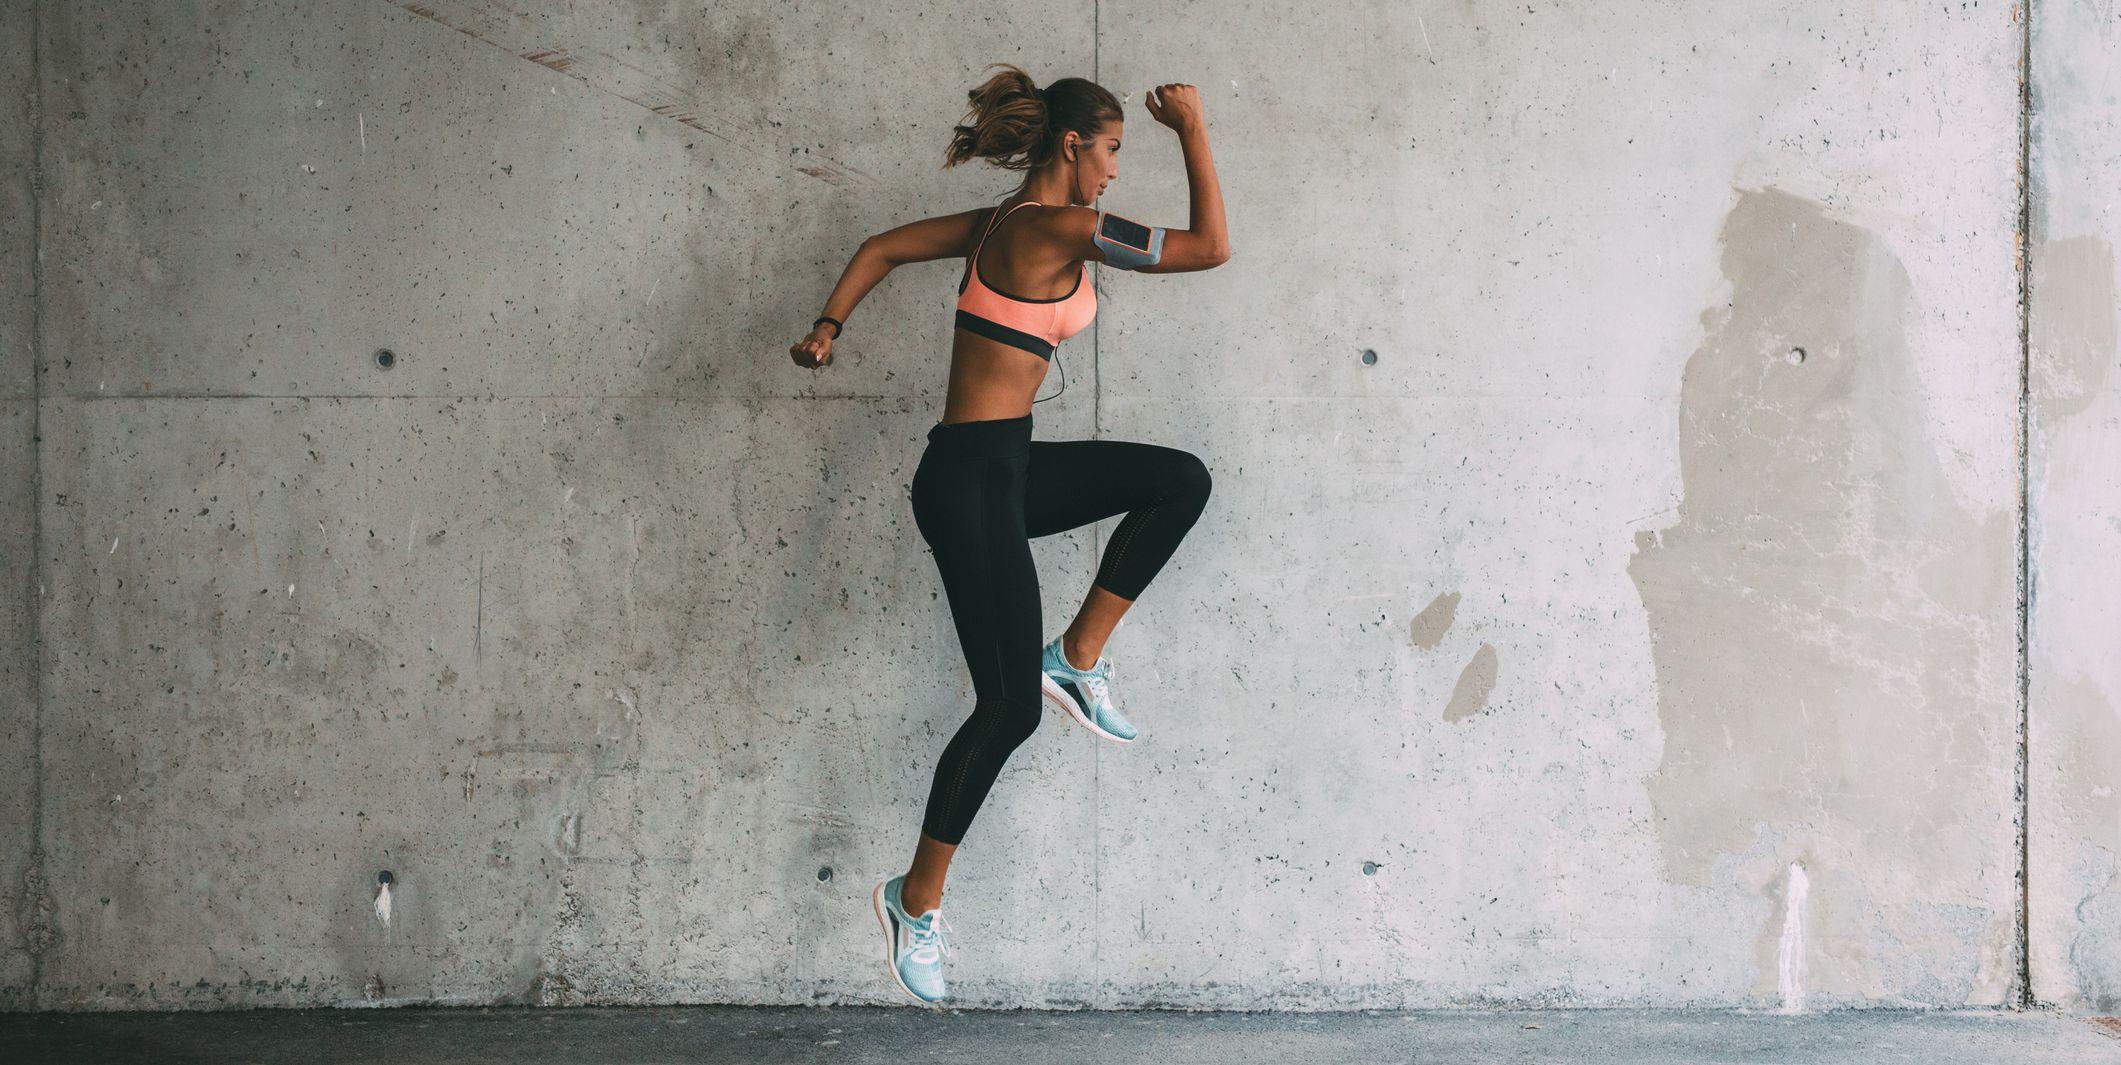 Sportswoman jumping